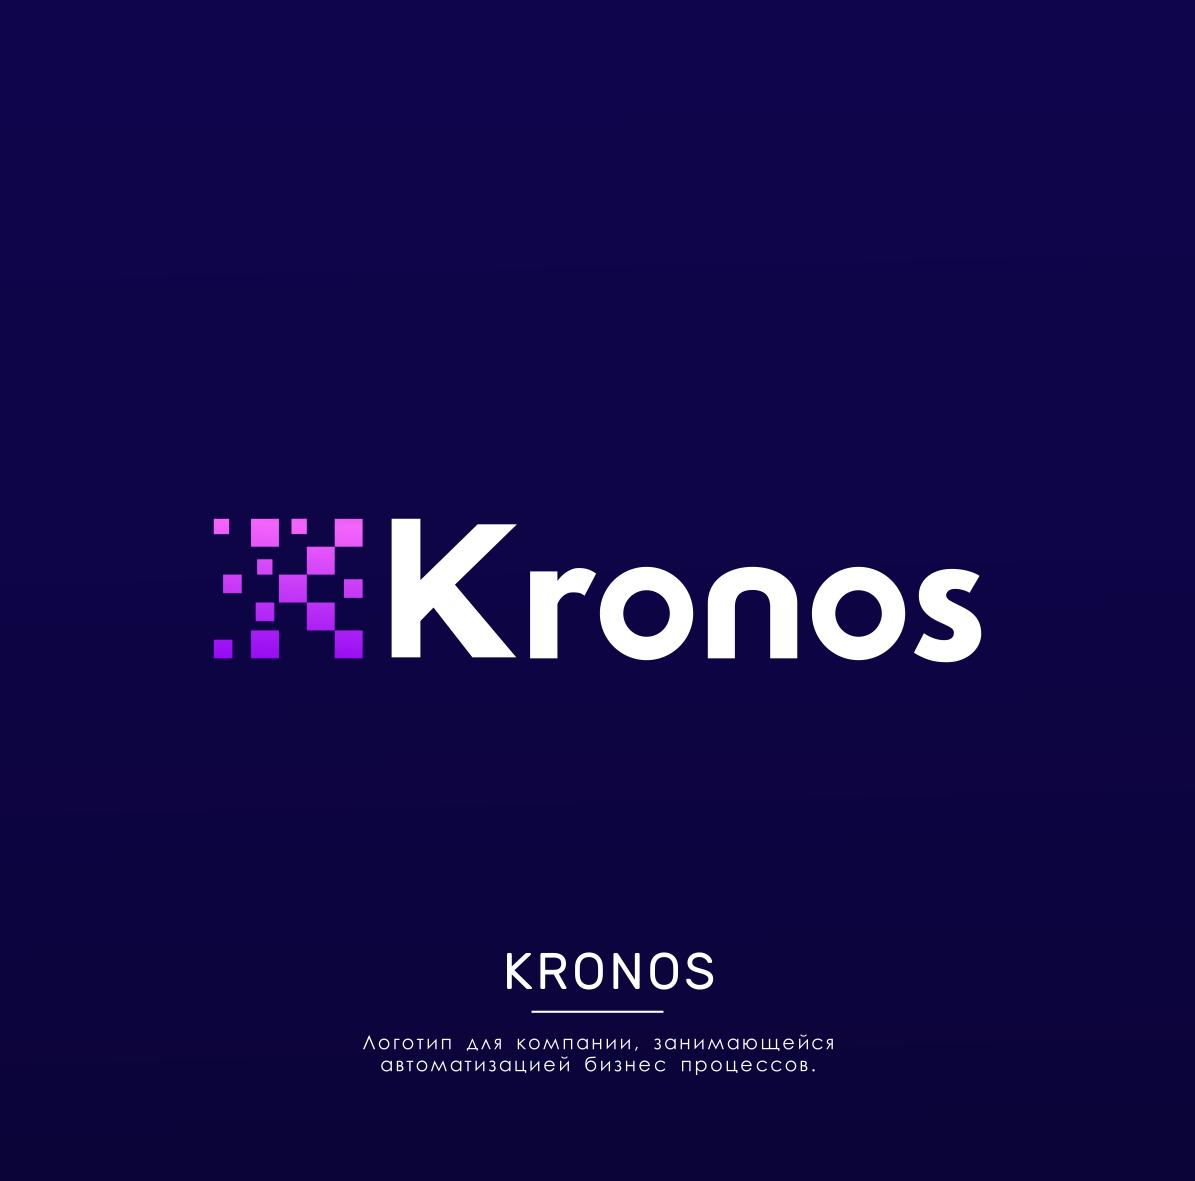 Разработать логотип KRONOS фото f_4635fb216d2c099f.png